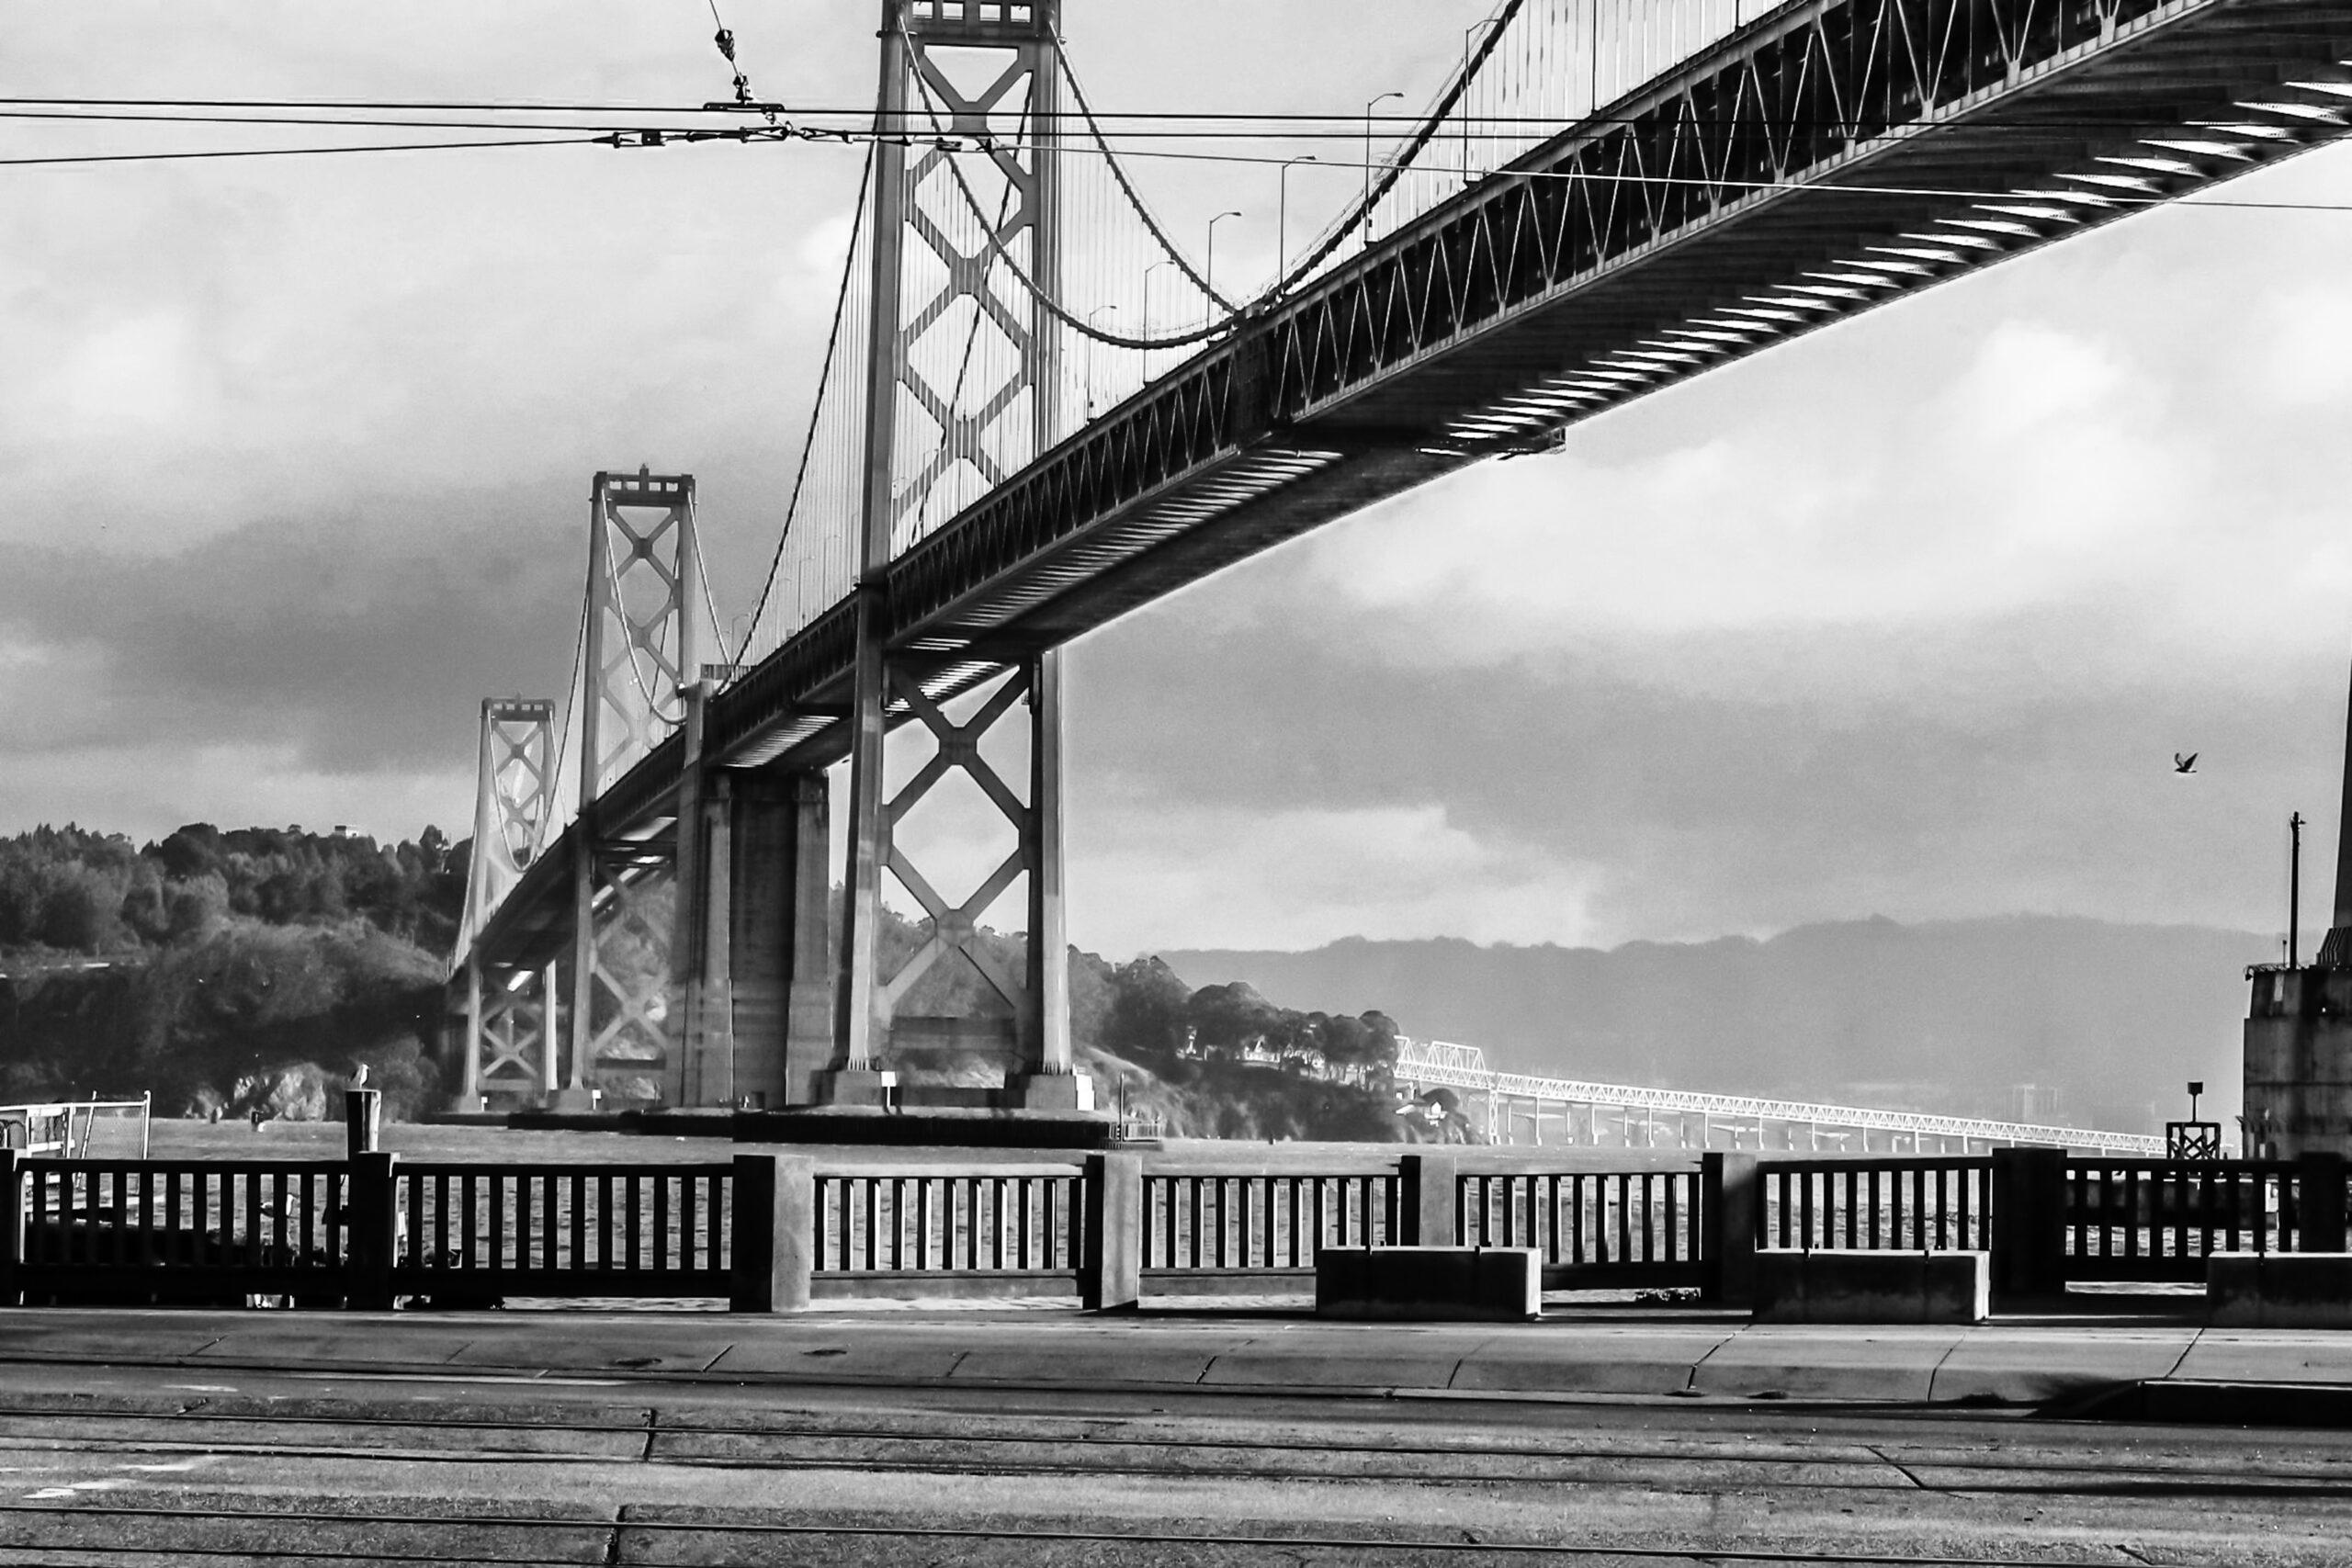 San Francisco Bay, Oakland Bay Bridge, Yerba Buena Island